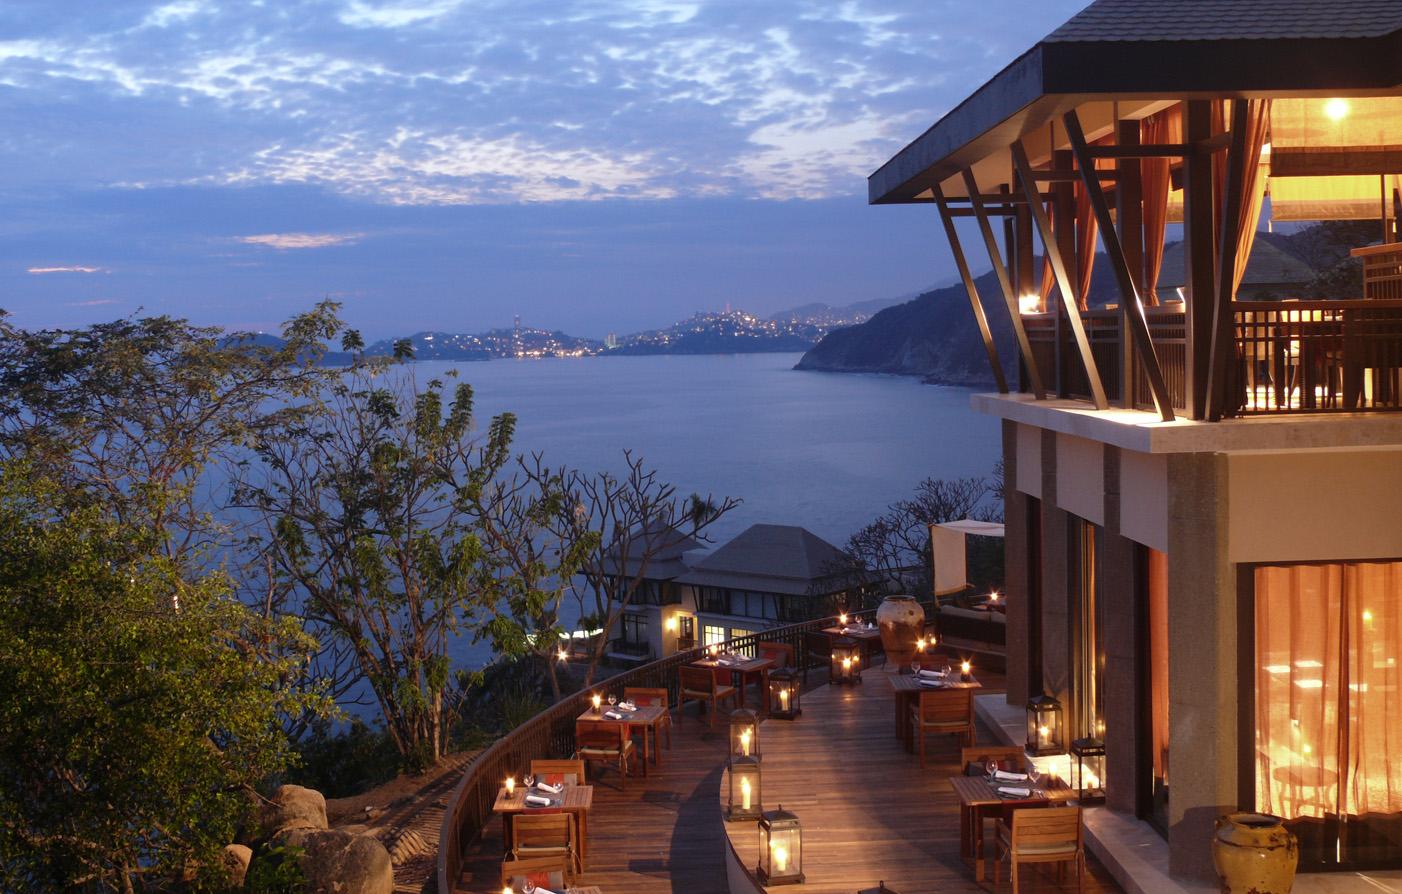 Mejores Hoteles de Playa - Resorts en Acapulco, México Ofertas de hoteles baratos